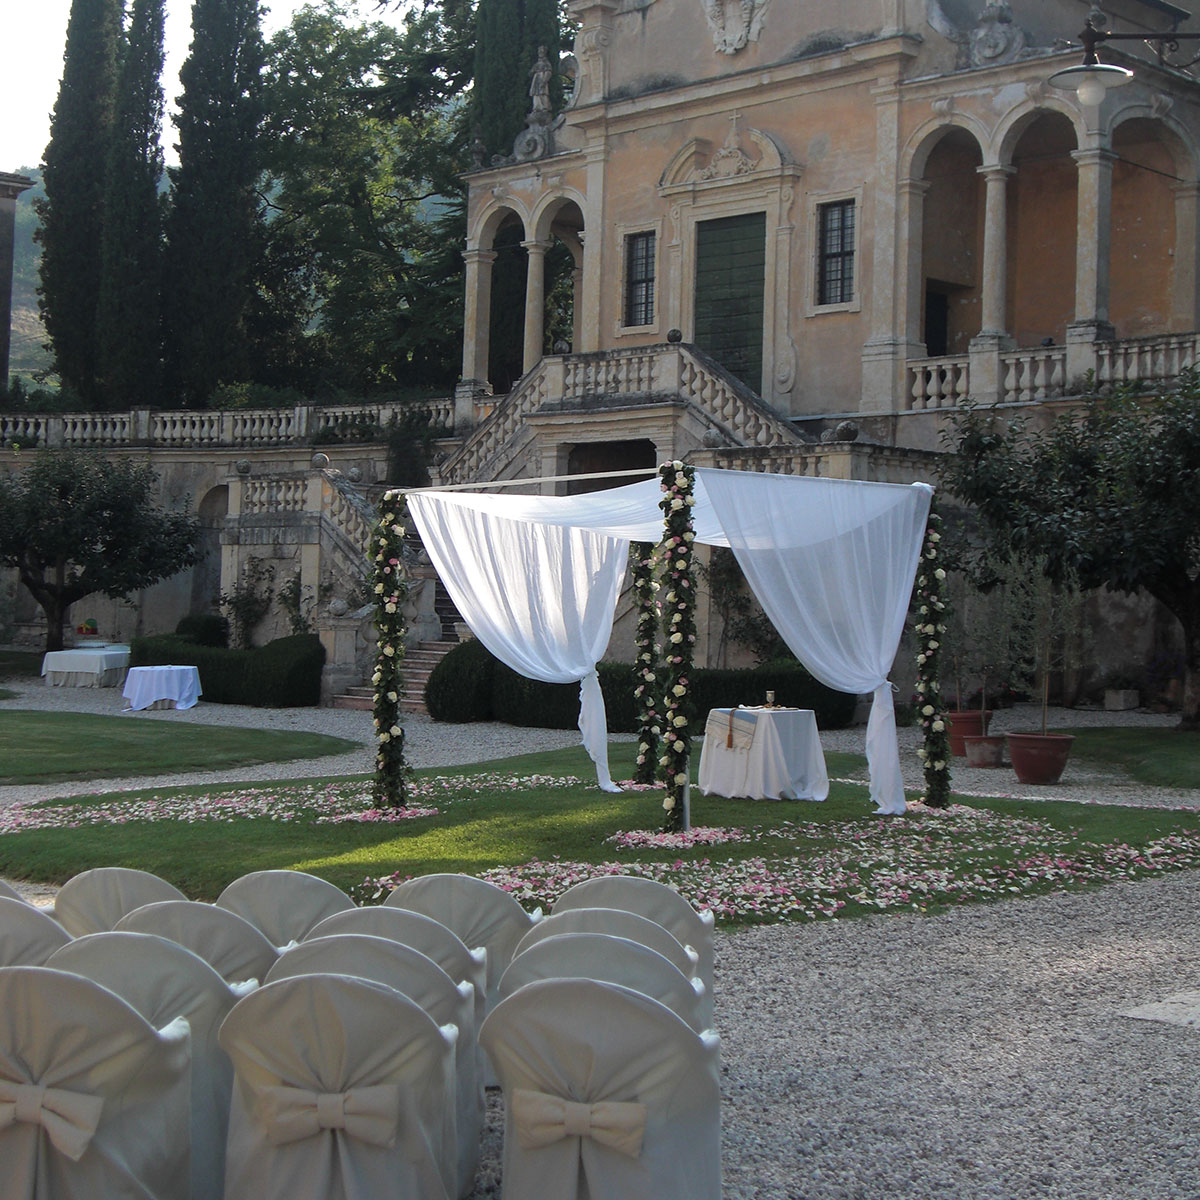 Matrimonio giardino in villa | Negriricevimenti.com